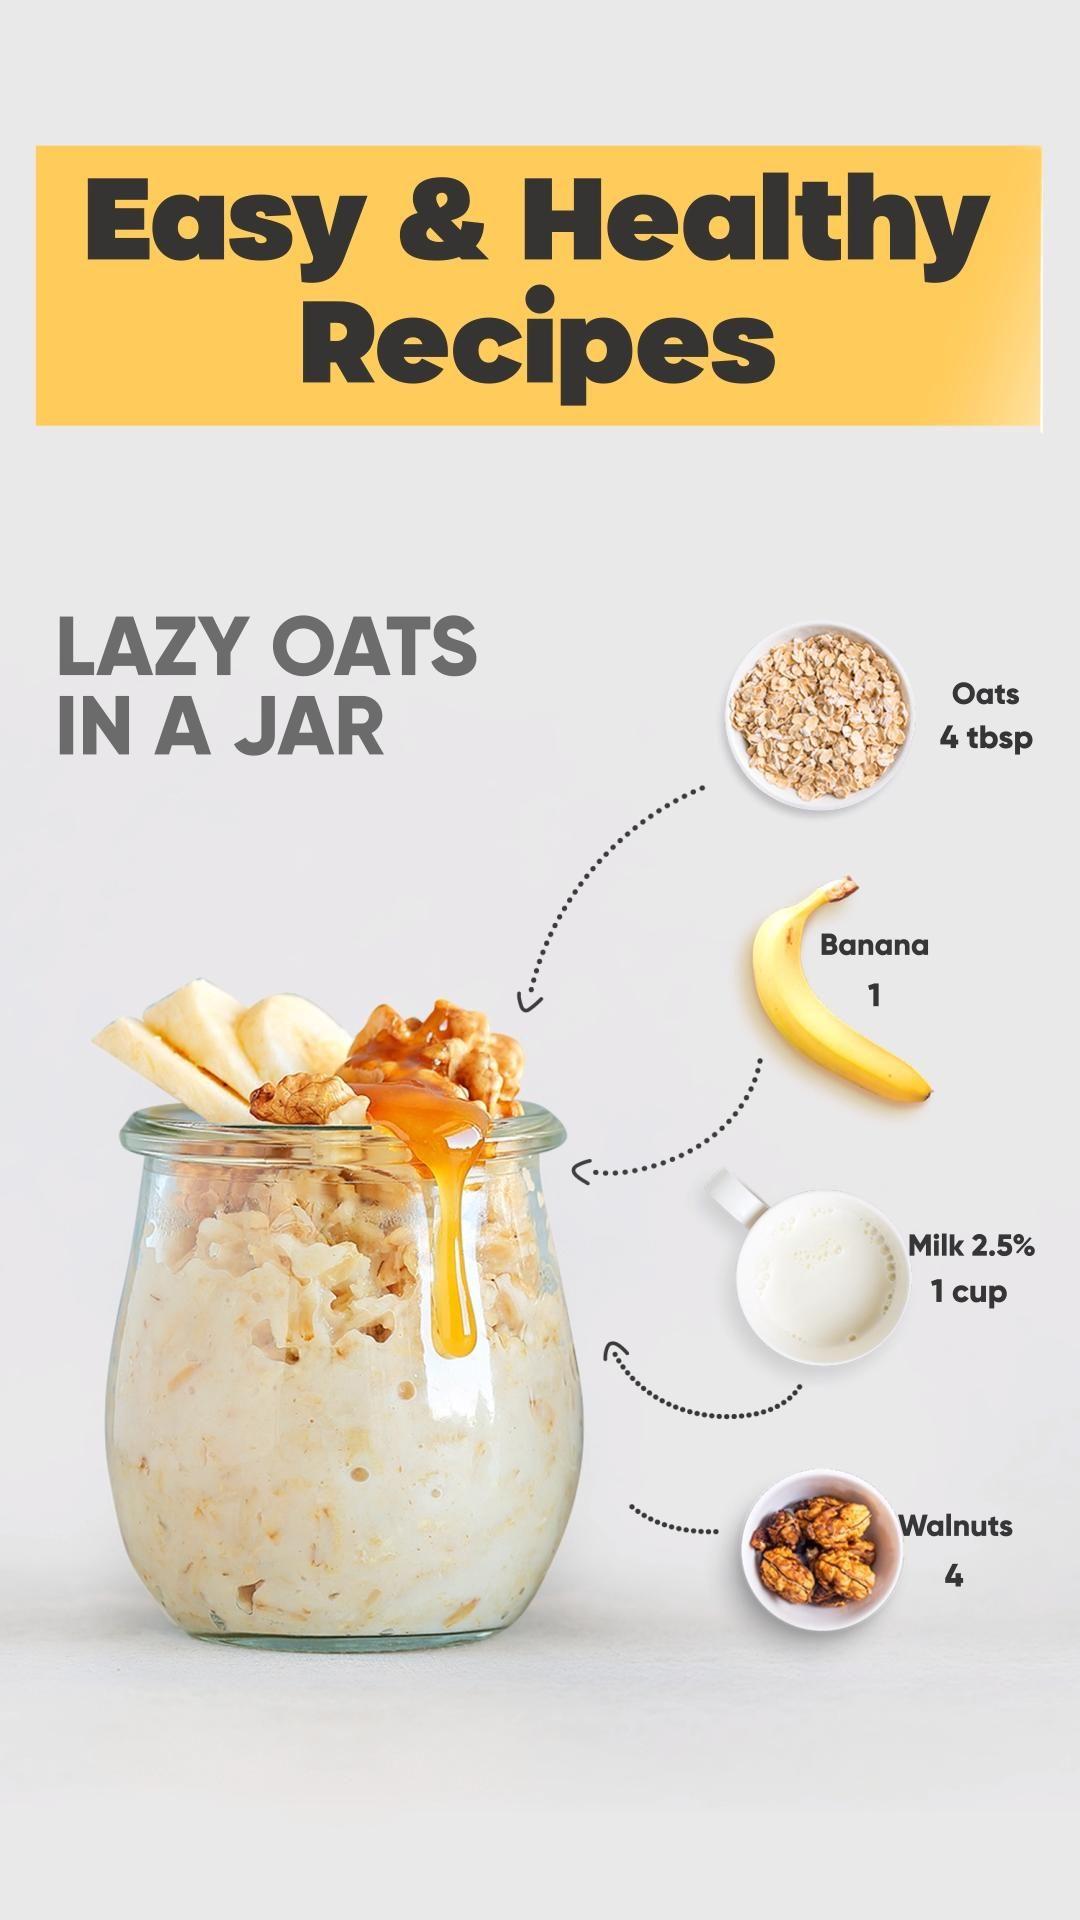 Healthy weight loss recipes -   17 desayuno fitness Mujer ideas